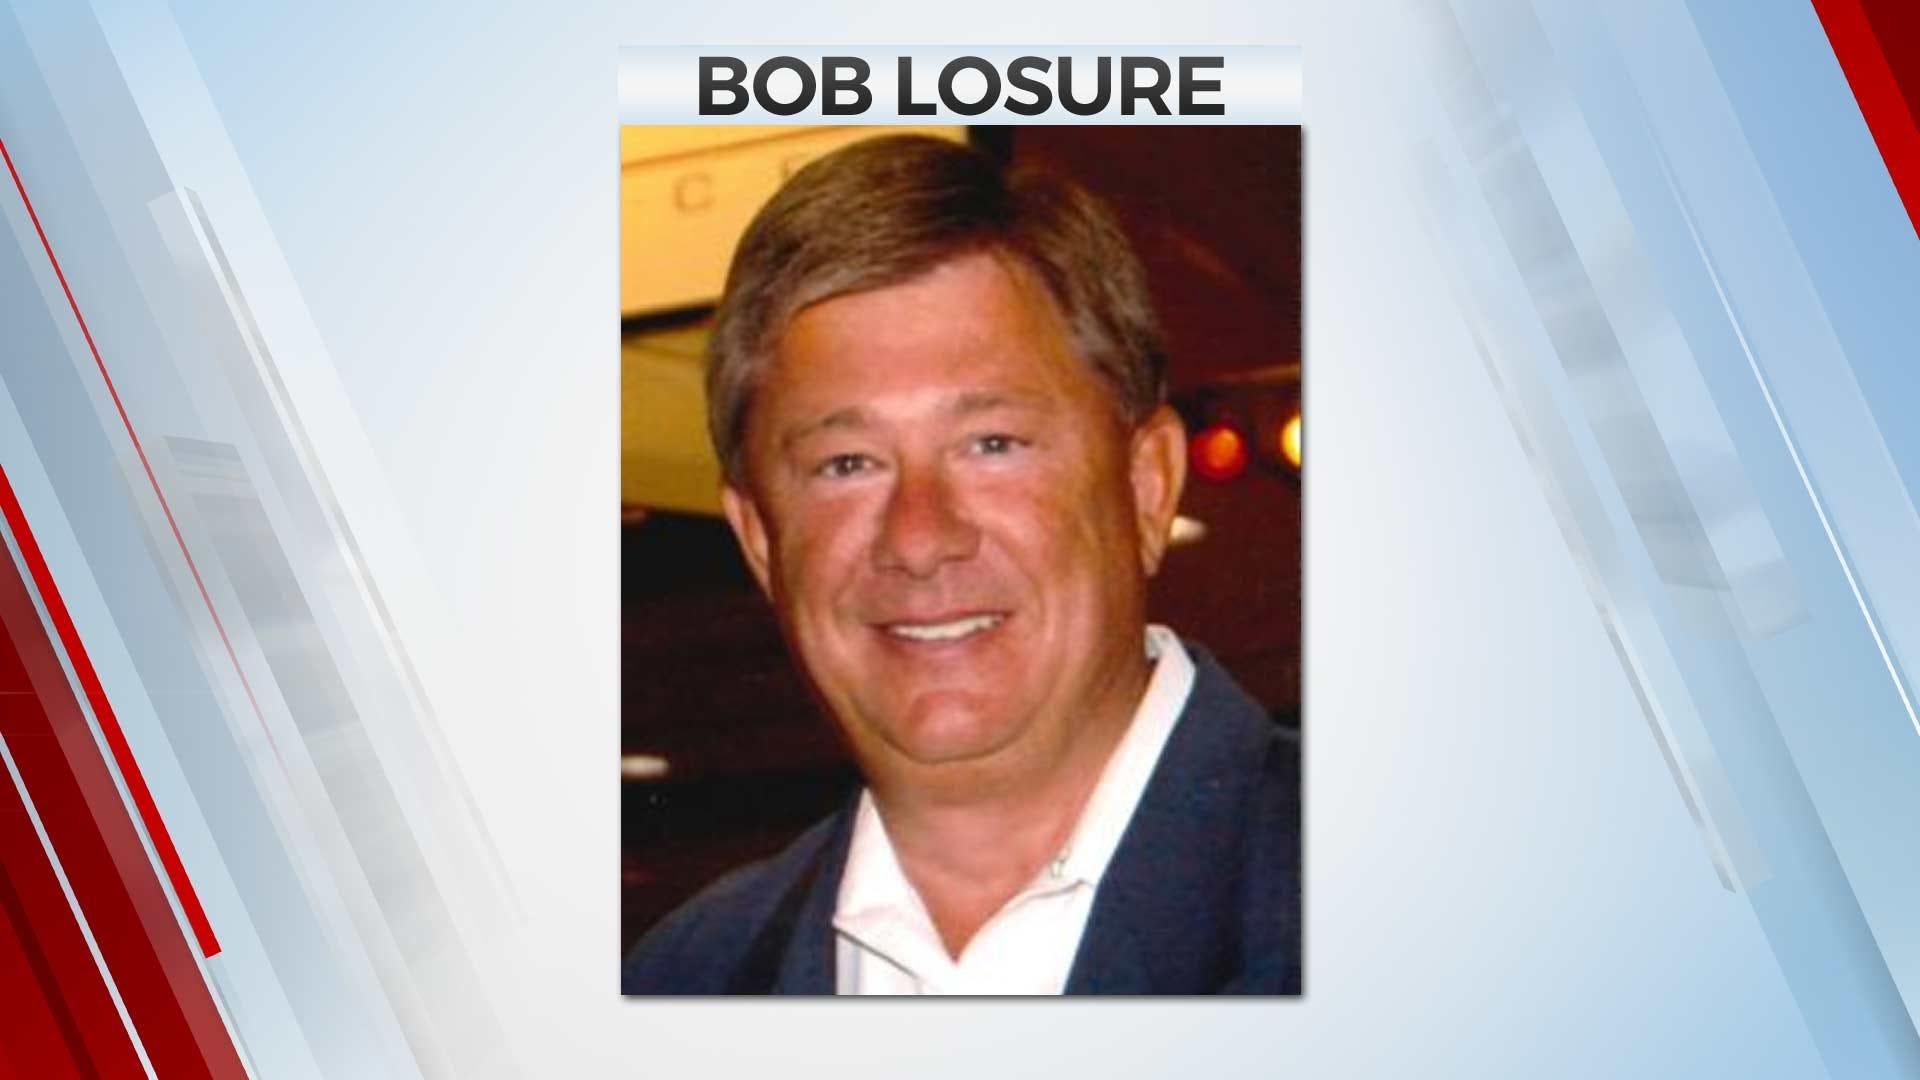 From The KOTV Vault: Remembering Bob Losure